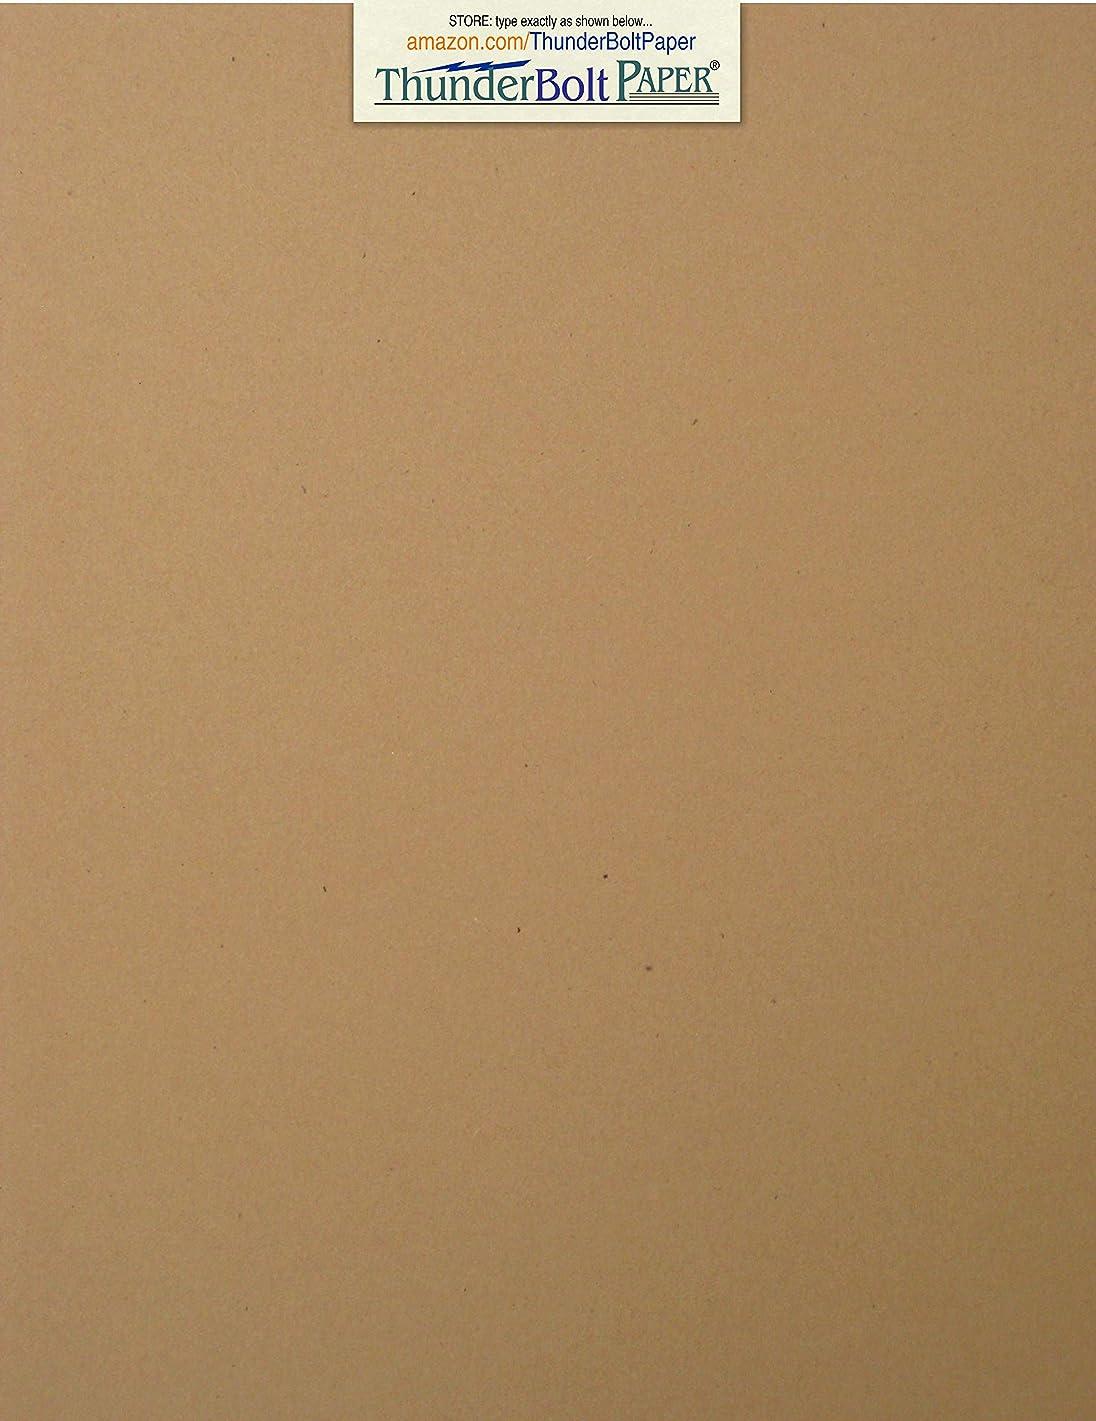 150 Brown Kraft Fiber 80# Cover Paper Sheets - 8.5